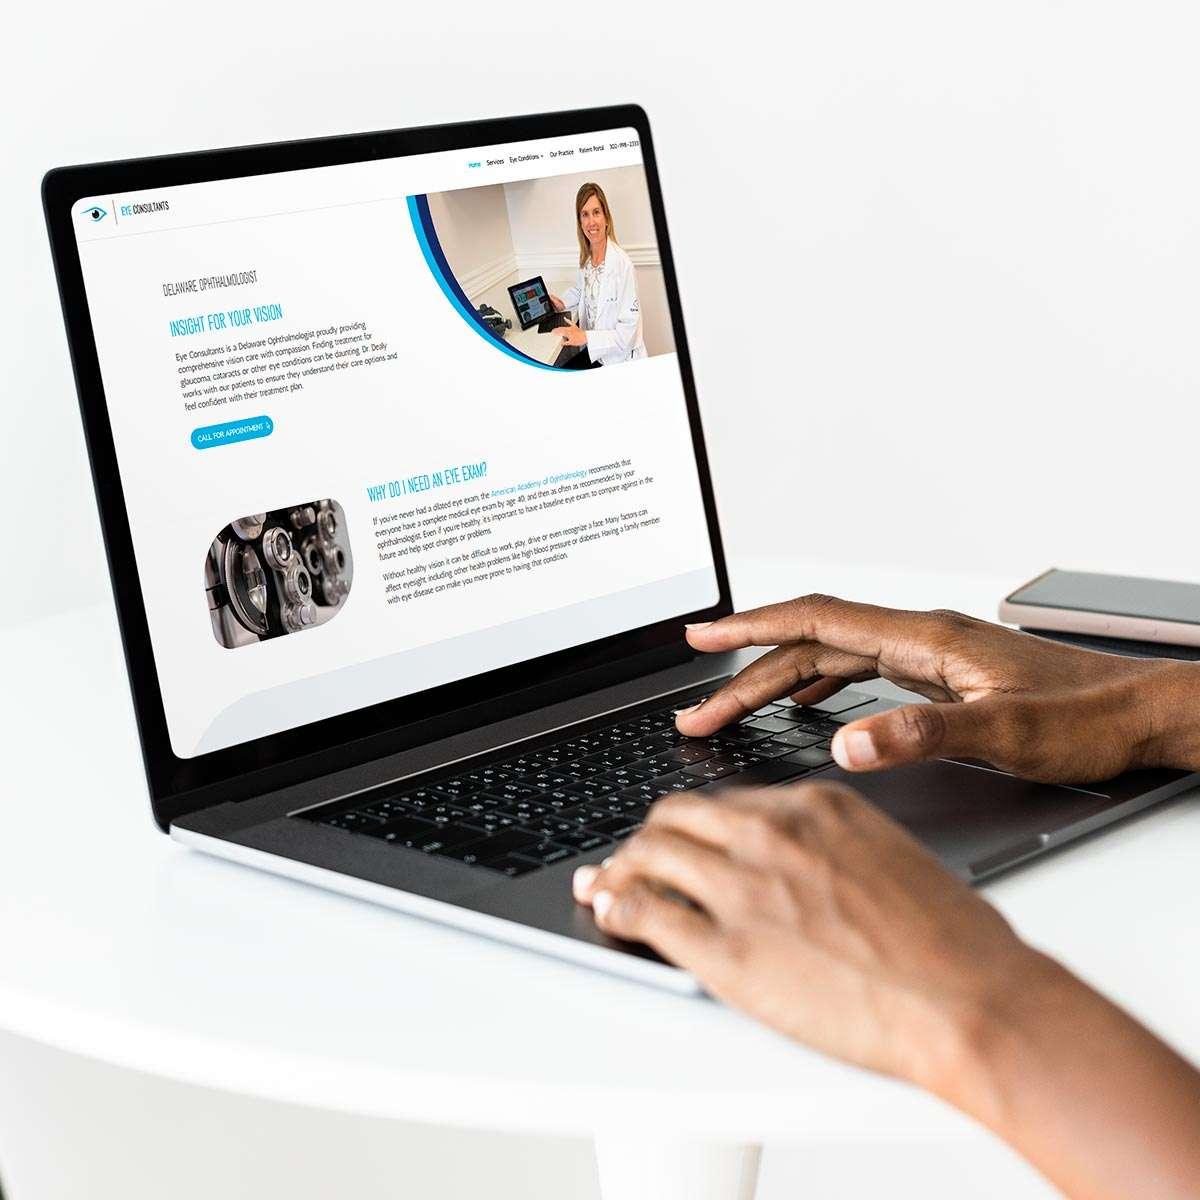 Optometrist website design by BrandSwan, a Delaware branding agency